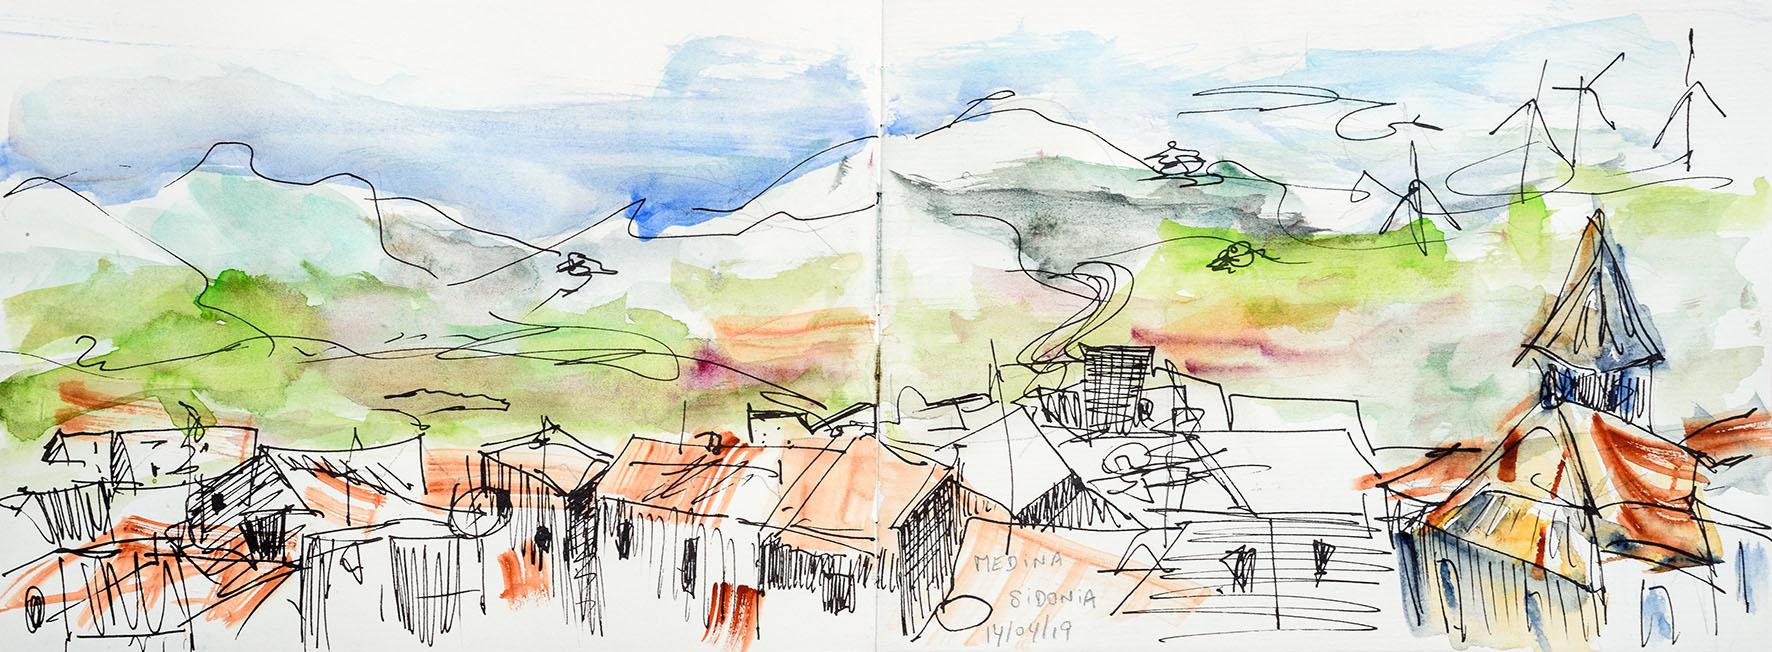 Medina-Sidonia, vue des hauteurs